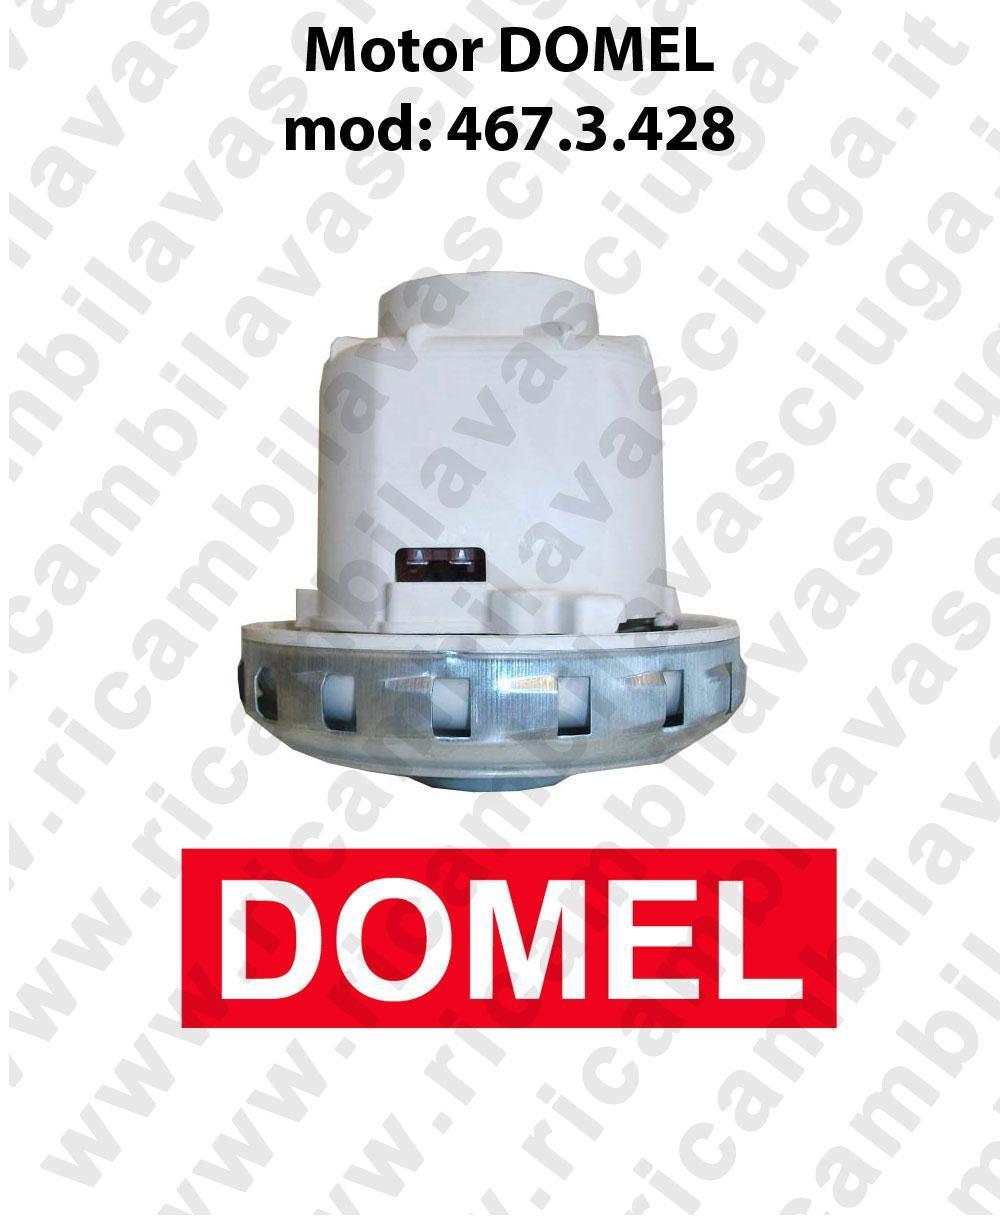 DOMEL Vacuum motor 467.3.428 for scrubber dryer e vacuum cleaner